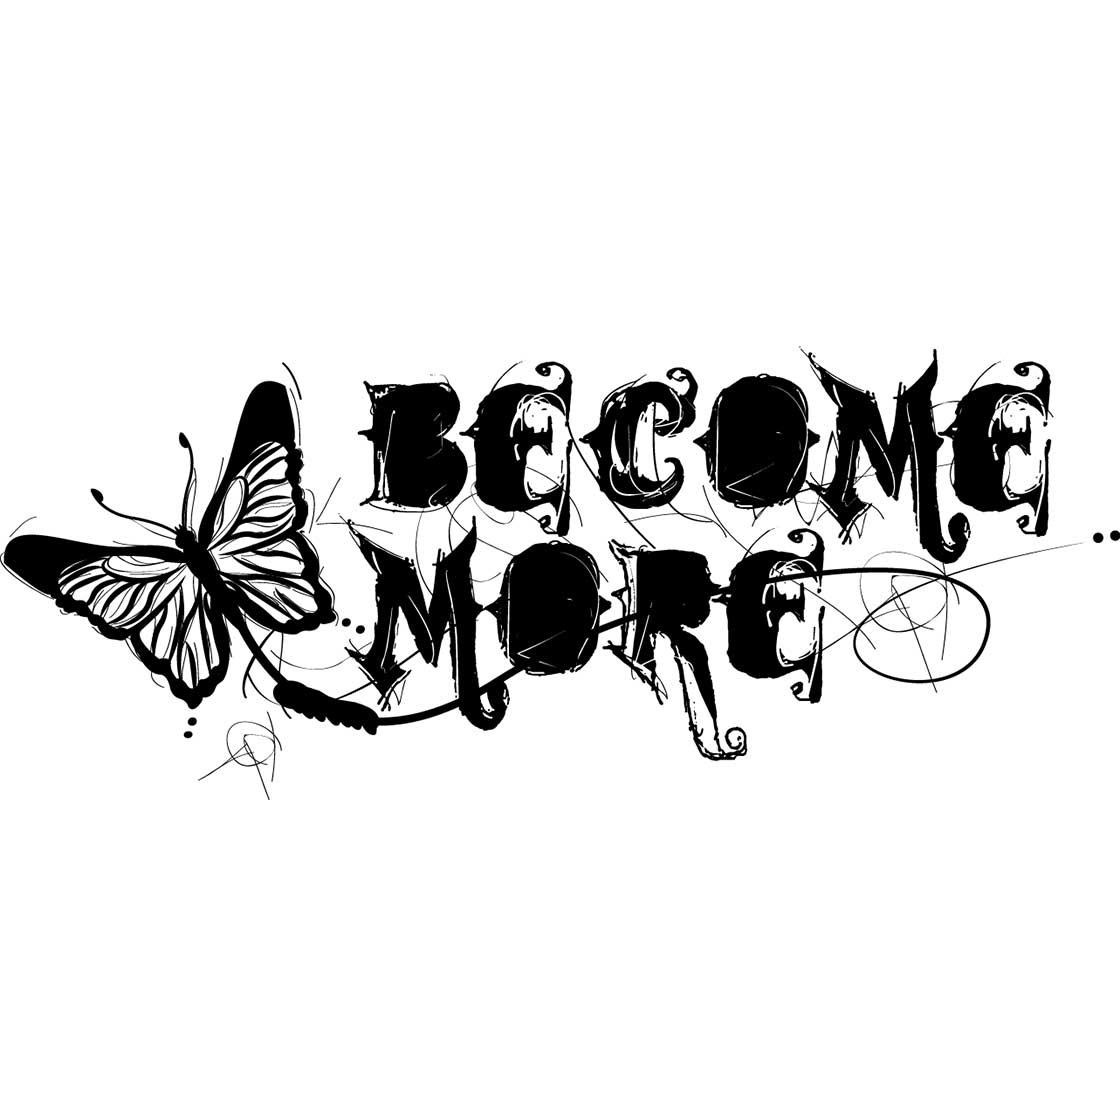 crowdspring tattoo design by prinsesa